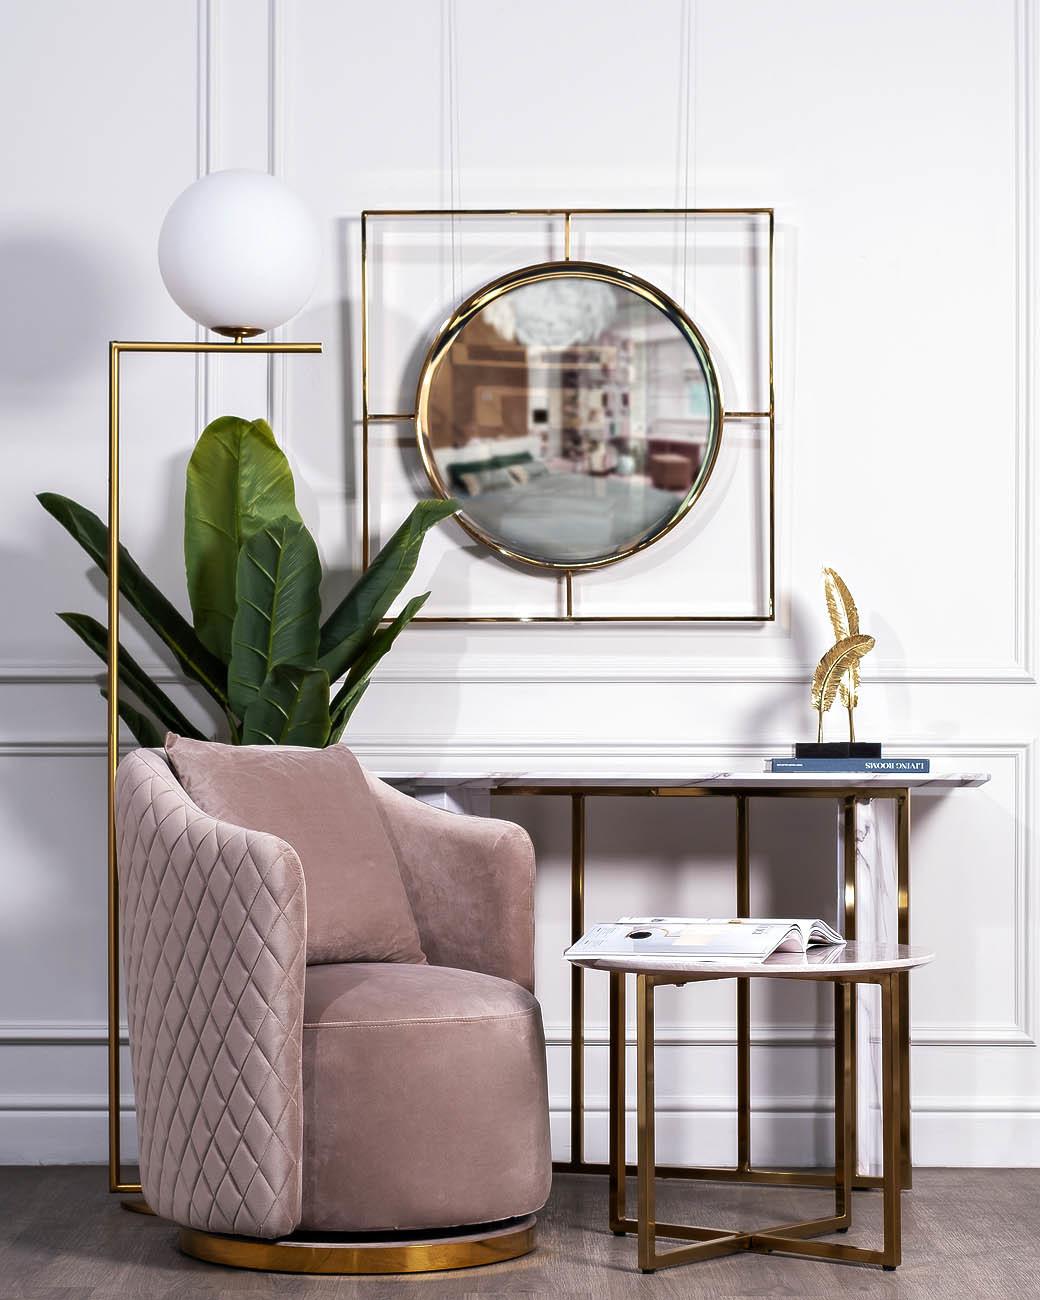 19-OA-5892 Зеркало золотое 80х80 см